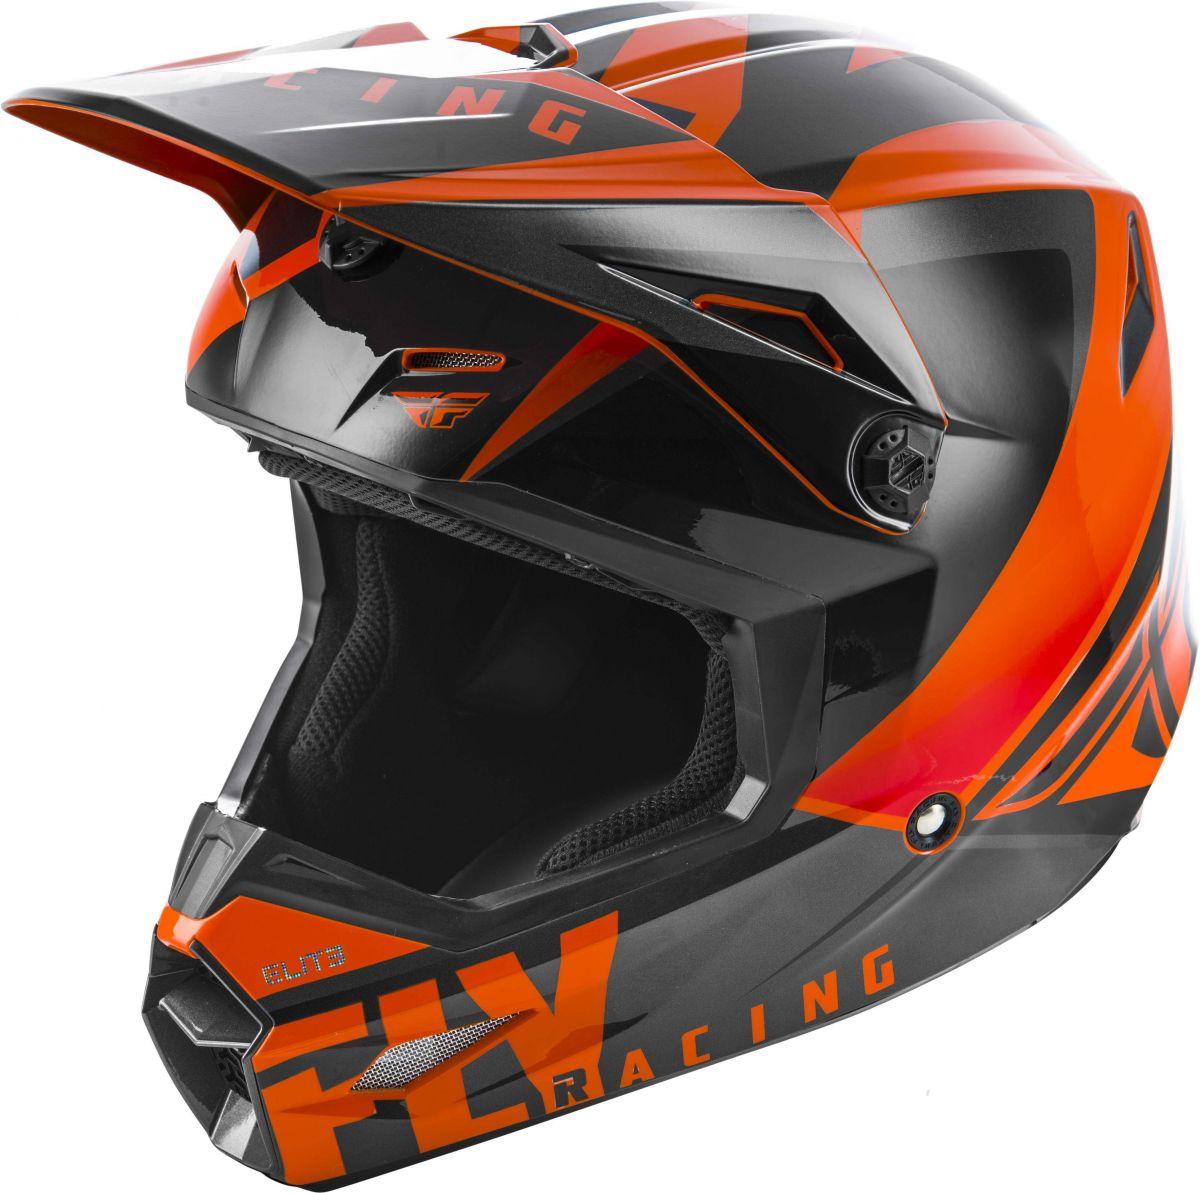 Fly - 2019 Elite Vigilant Orange/Black шлем, оранжево-черный